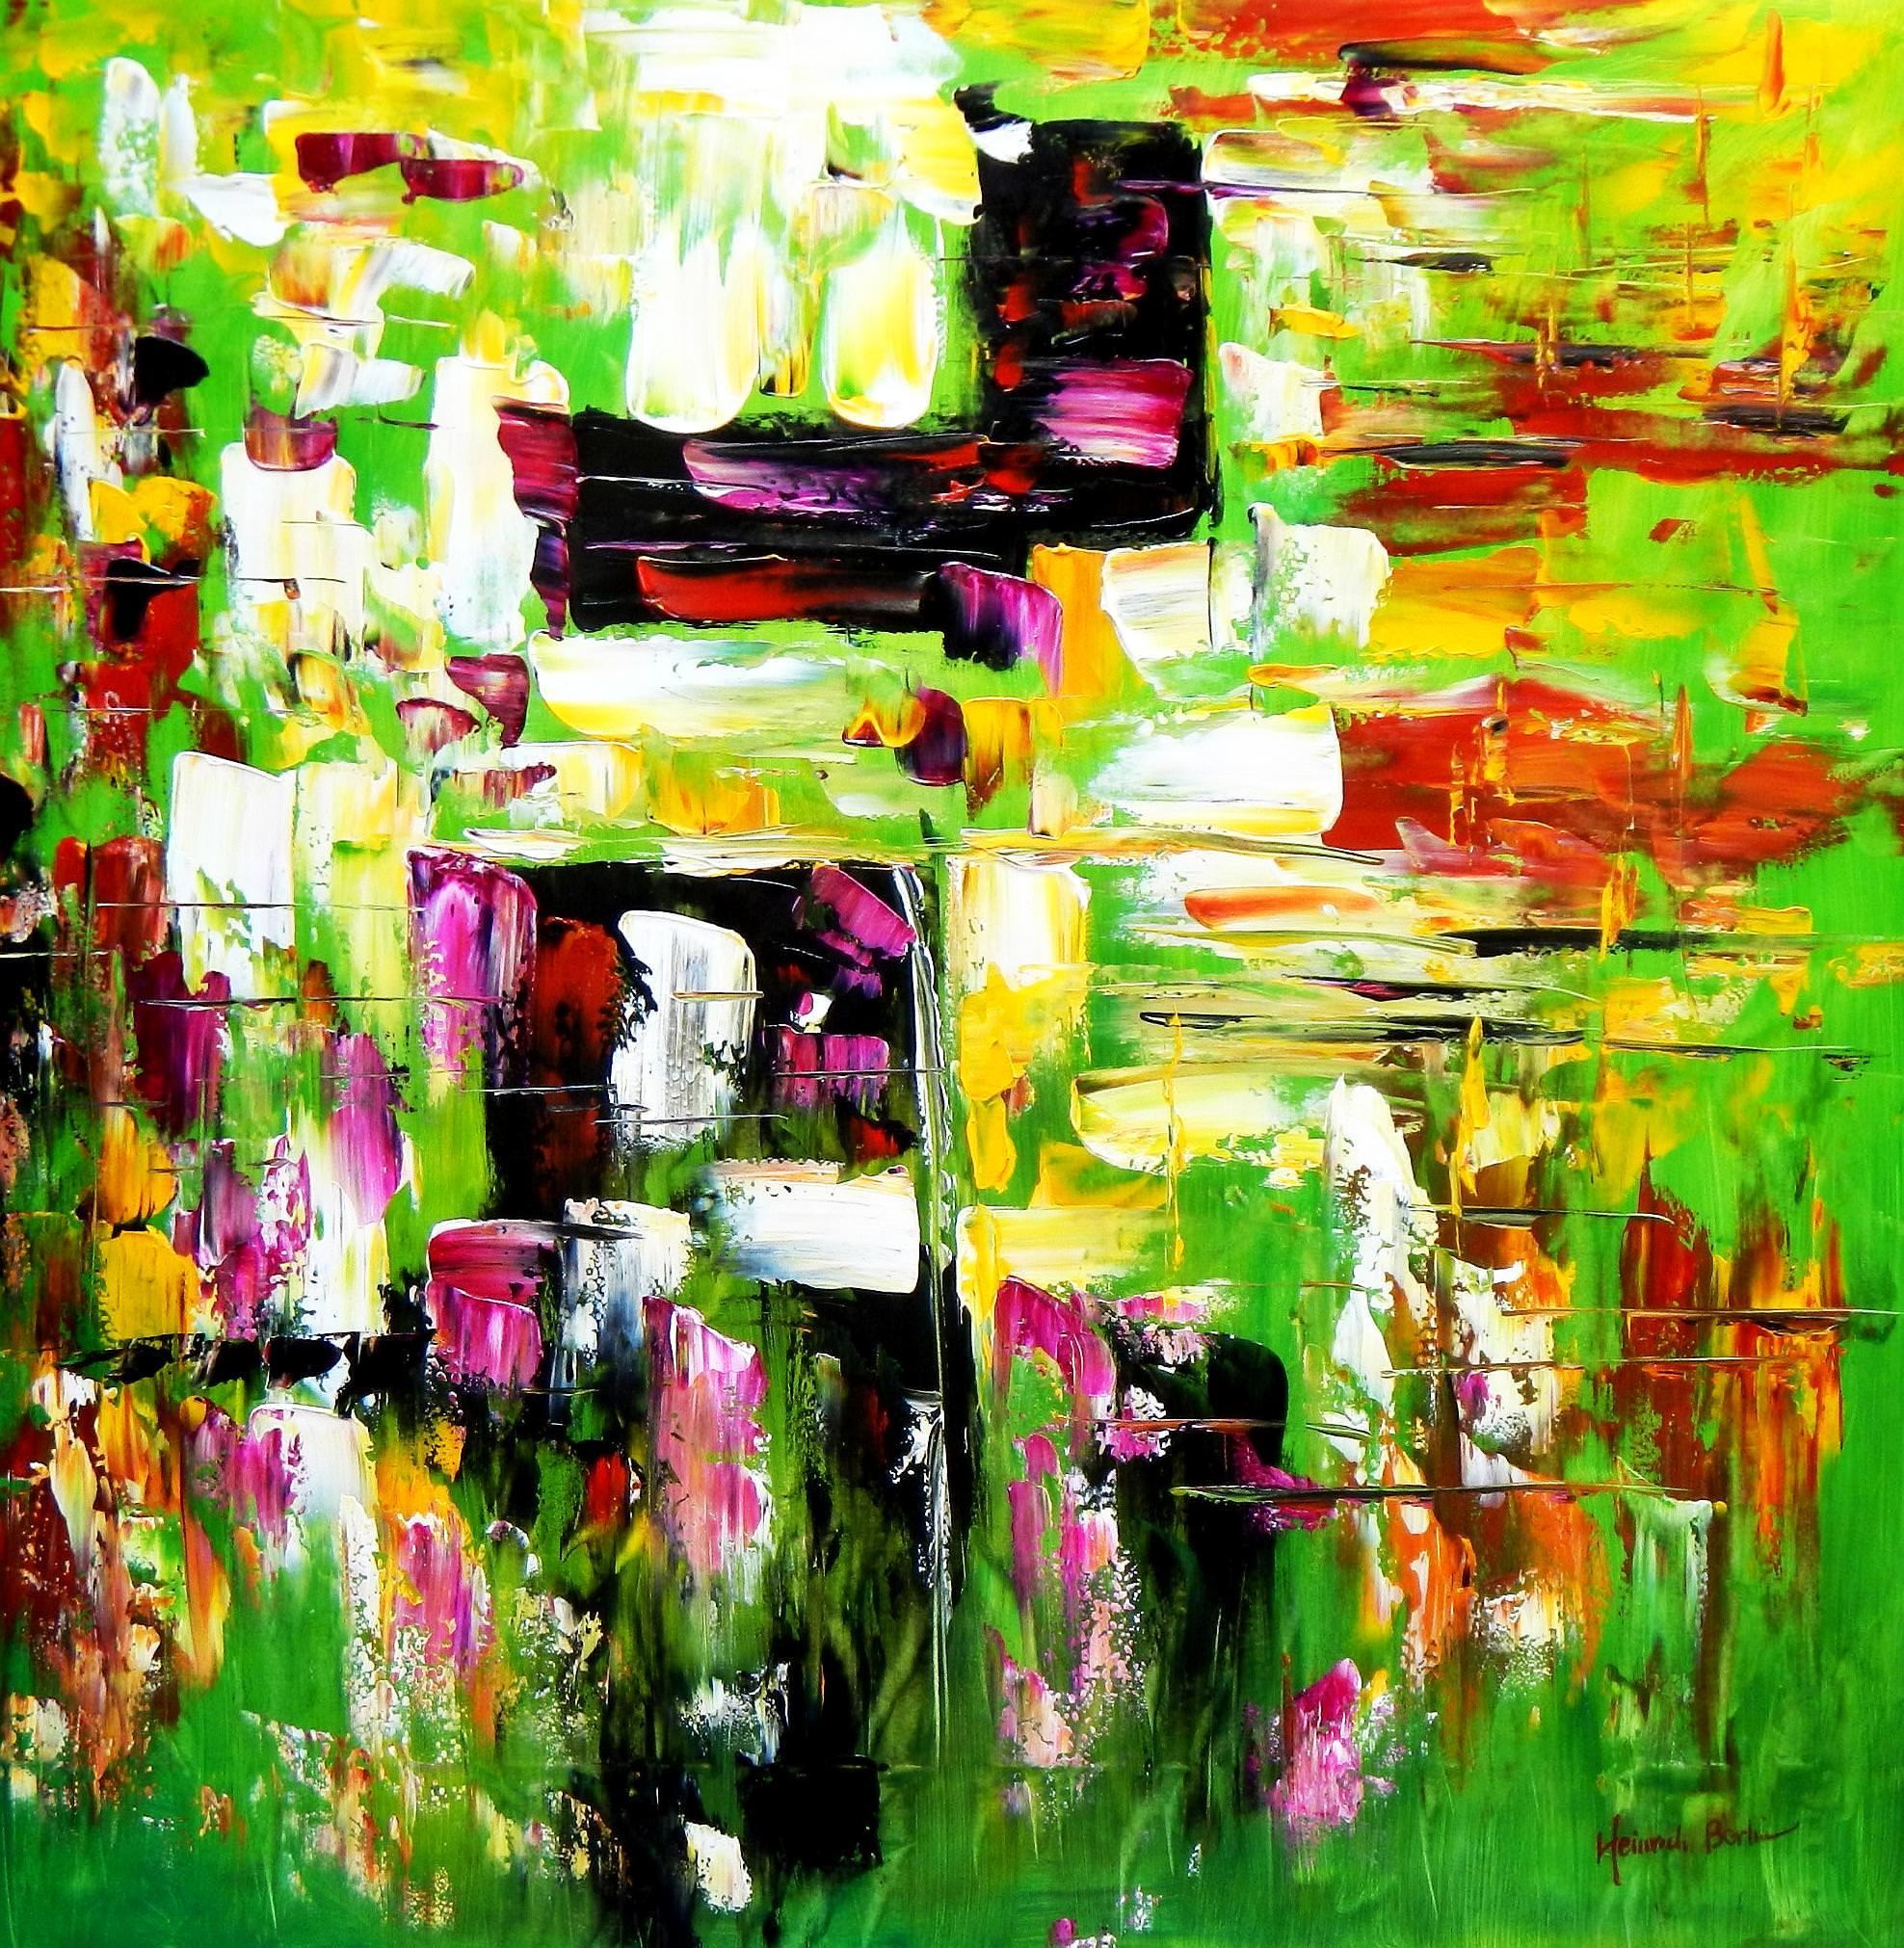 Abstrakt - Berlin Tiergarten m92998 120x120cm abstraktes Ölbild handgemalt